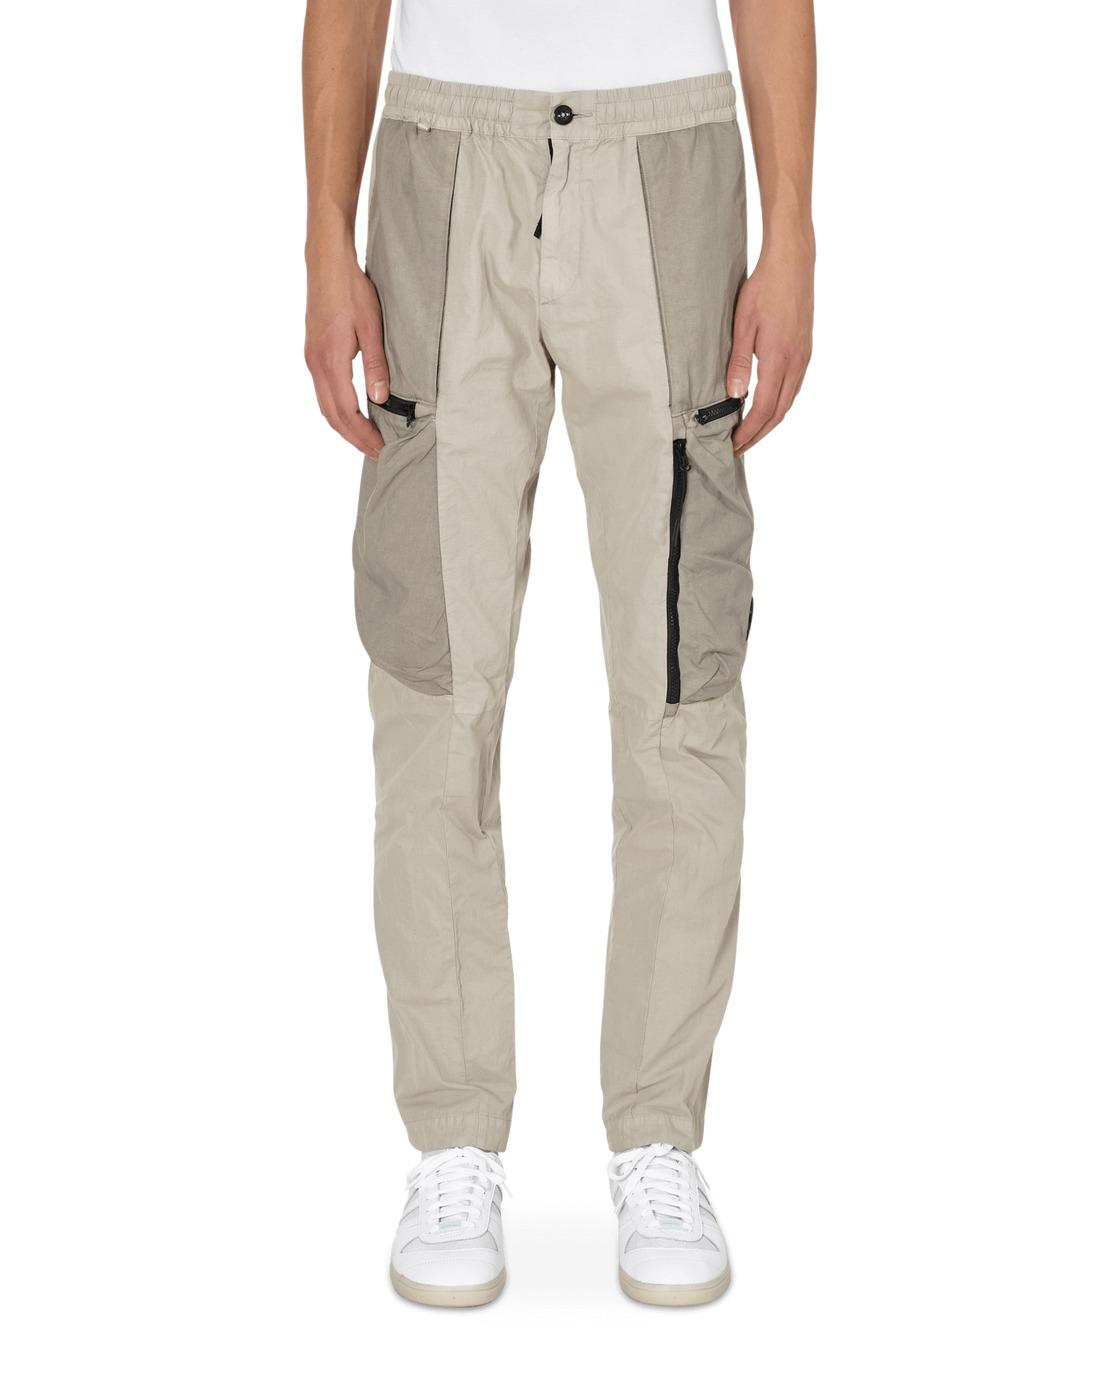 C.P. Company 50 Fili Lens Pocket Track Pants Quiet Gray